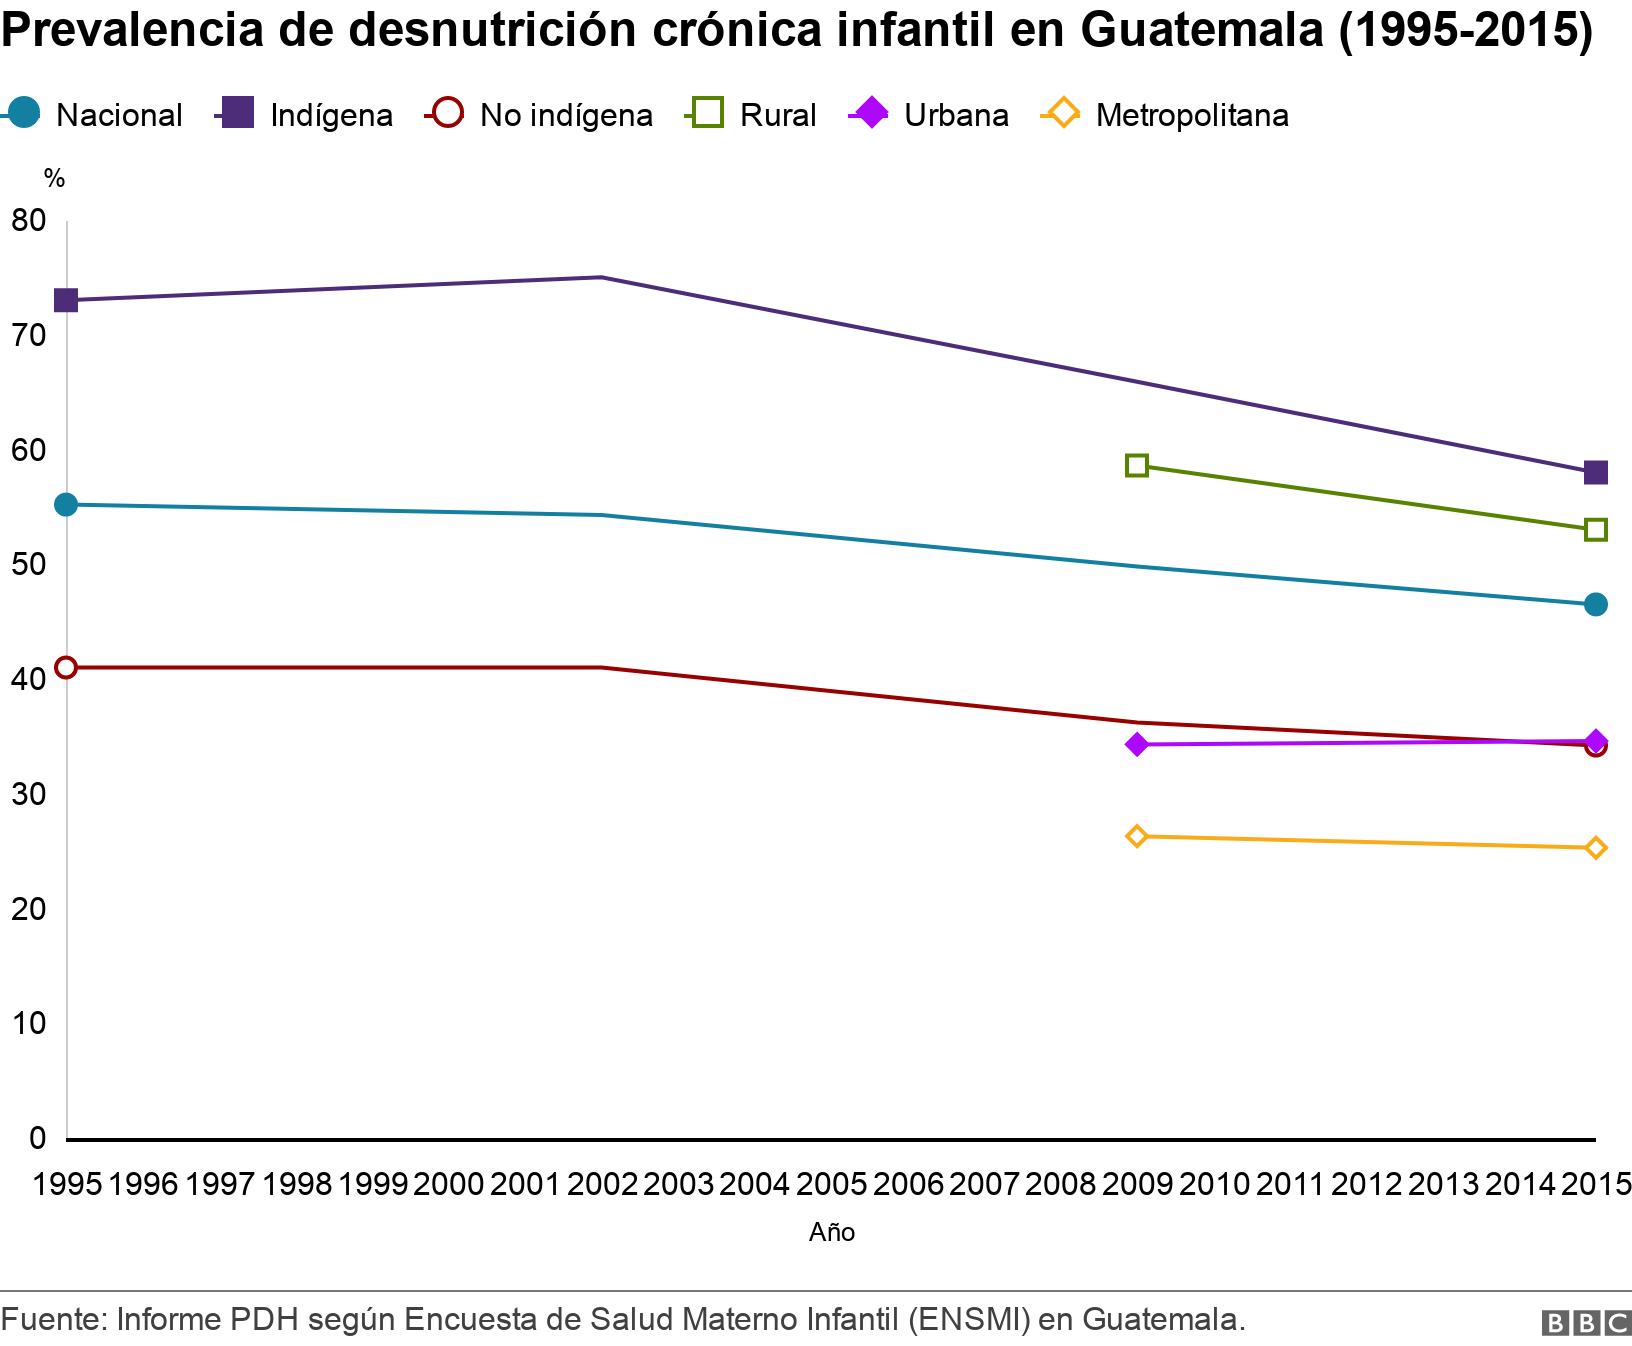 Prevalencia de desnutrición crónica infantil en Guatemala (1995-2015). .  .